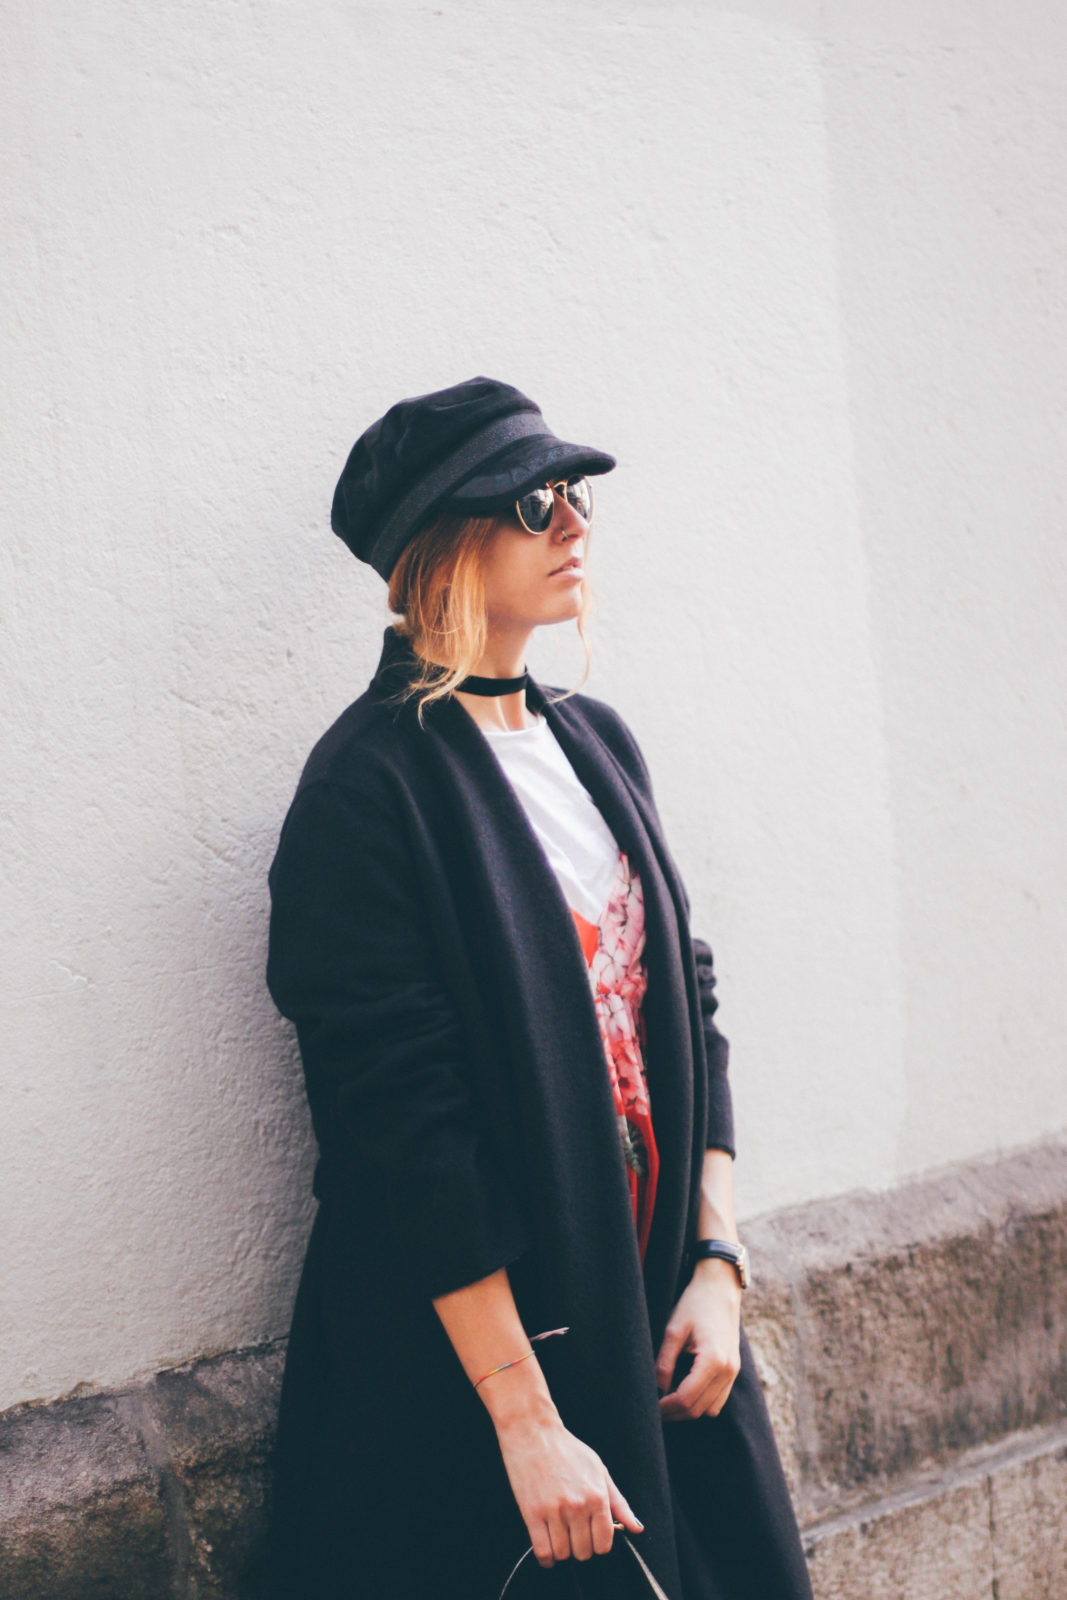 baker_boy_hat_vestido_con_camiseta_gorra_marinera_botines_hebillas_fall_2016_trends_street_style_outfits_donkeycool-25